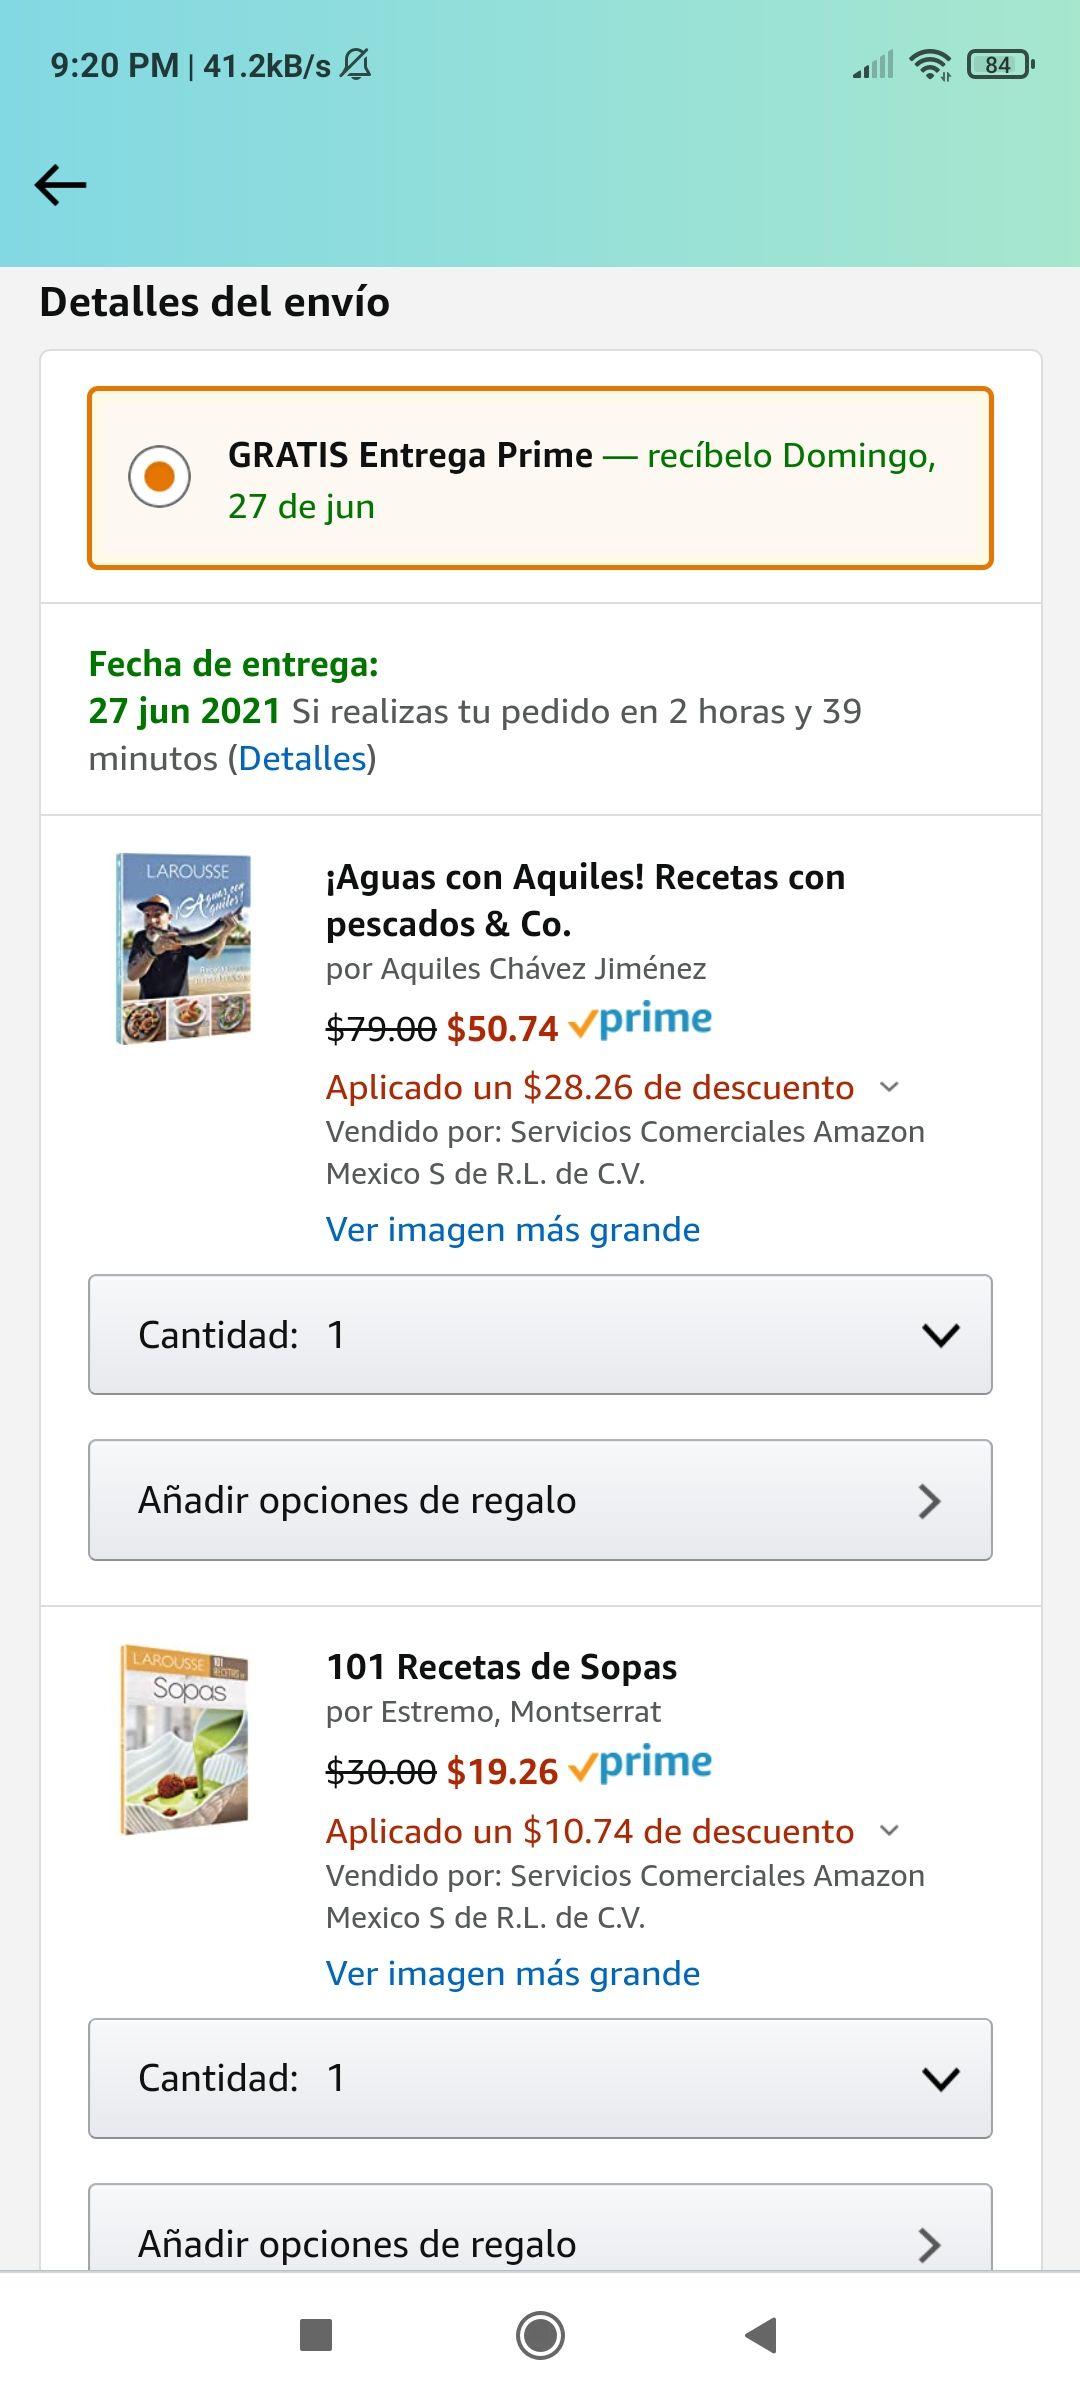 Amazon Libros: ¡Aguas con Aquiles! + 101 Recetas de sopa